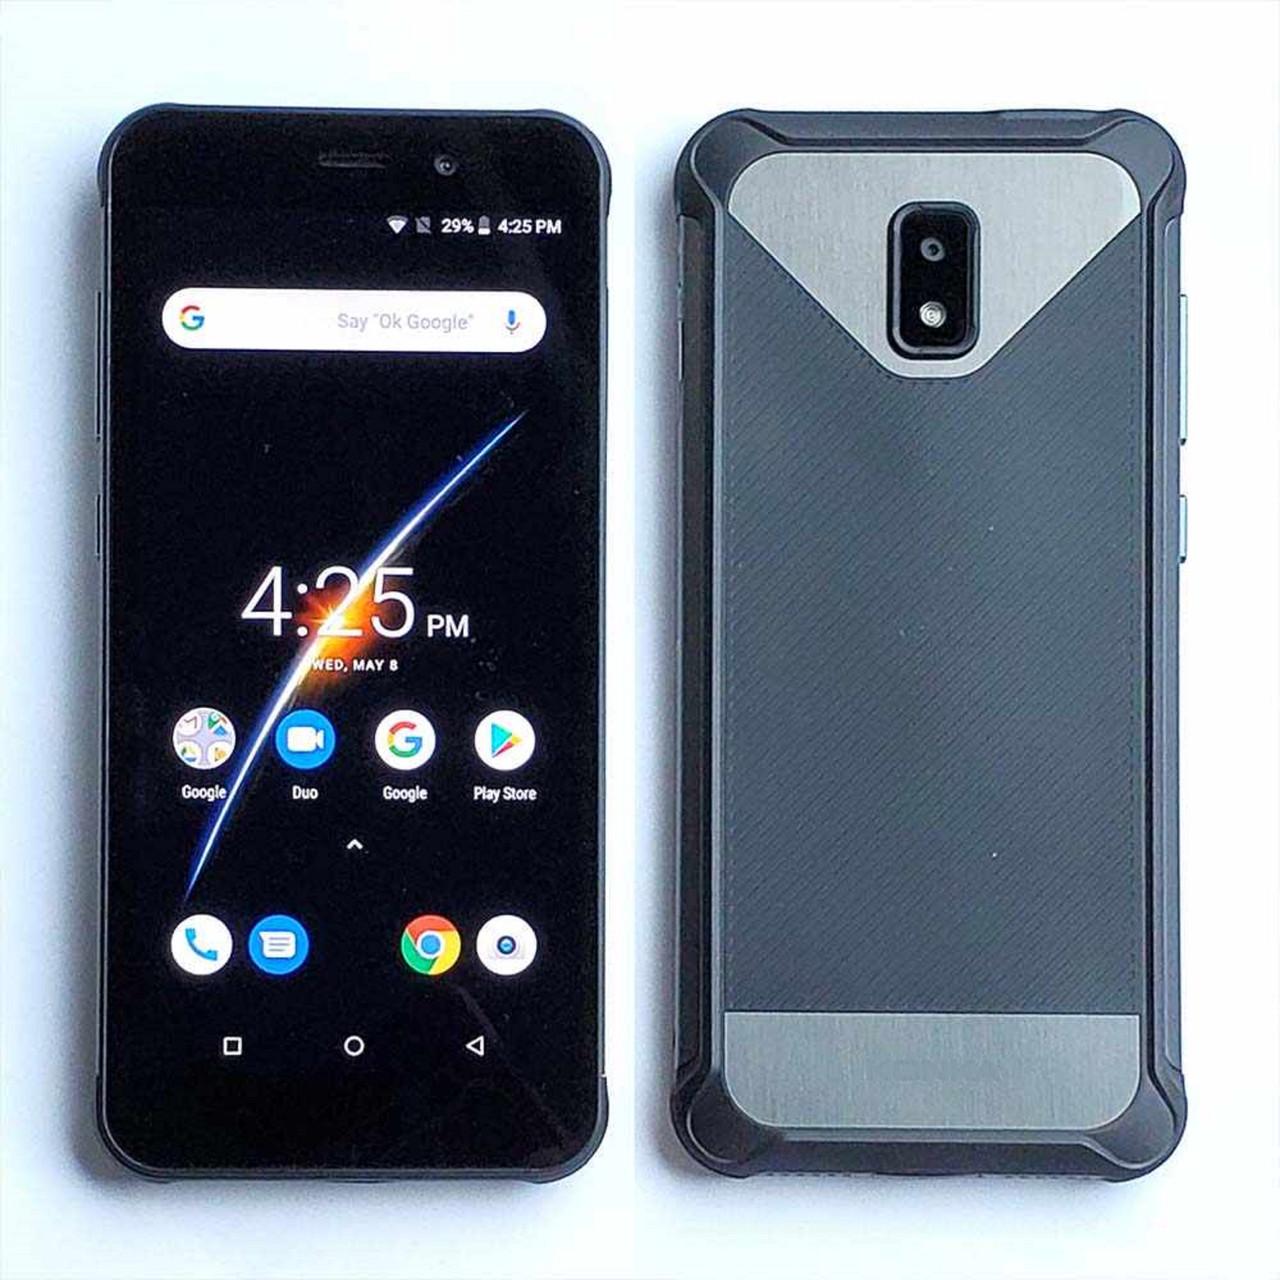 Мобильный телефон Rover R1 black 5000мАч 32 GB